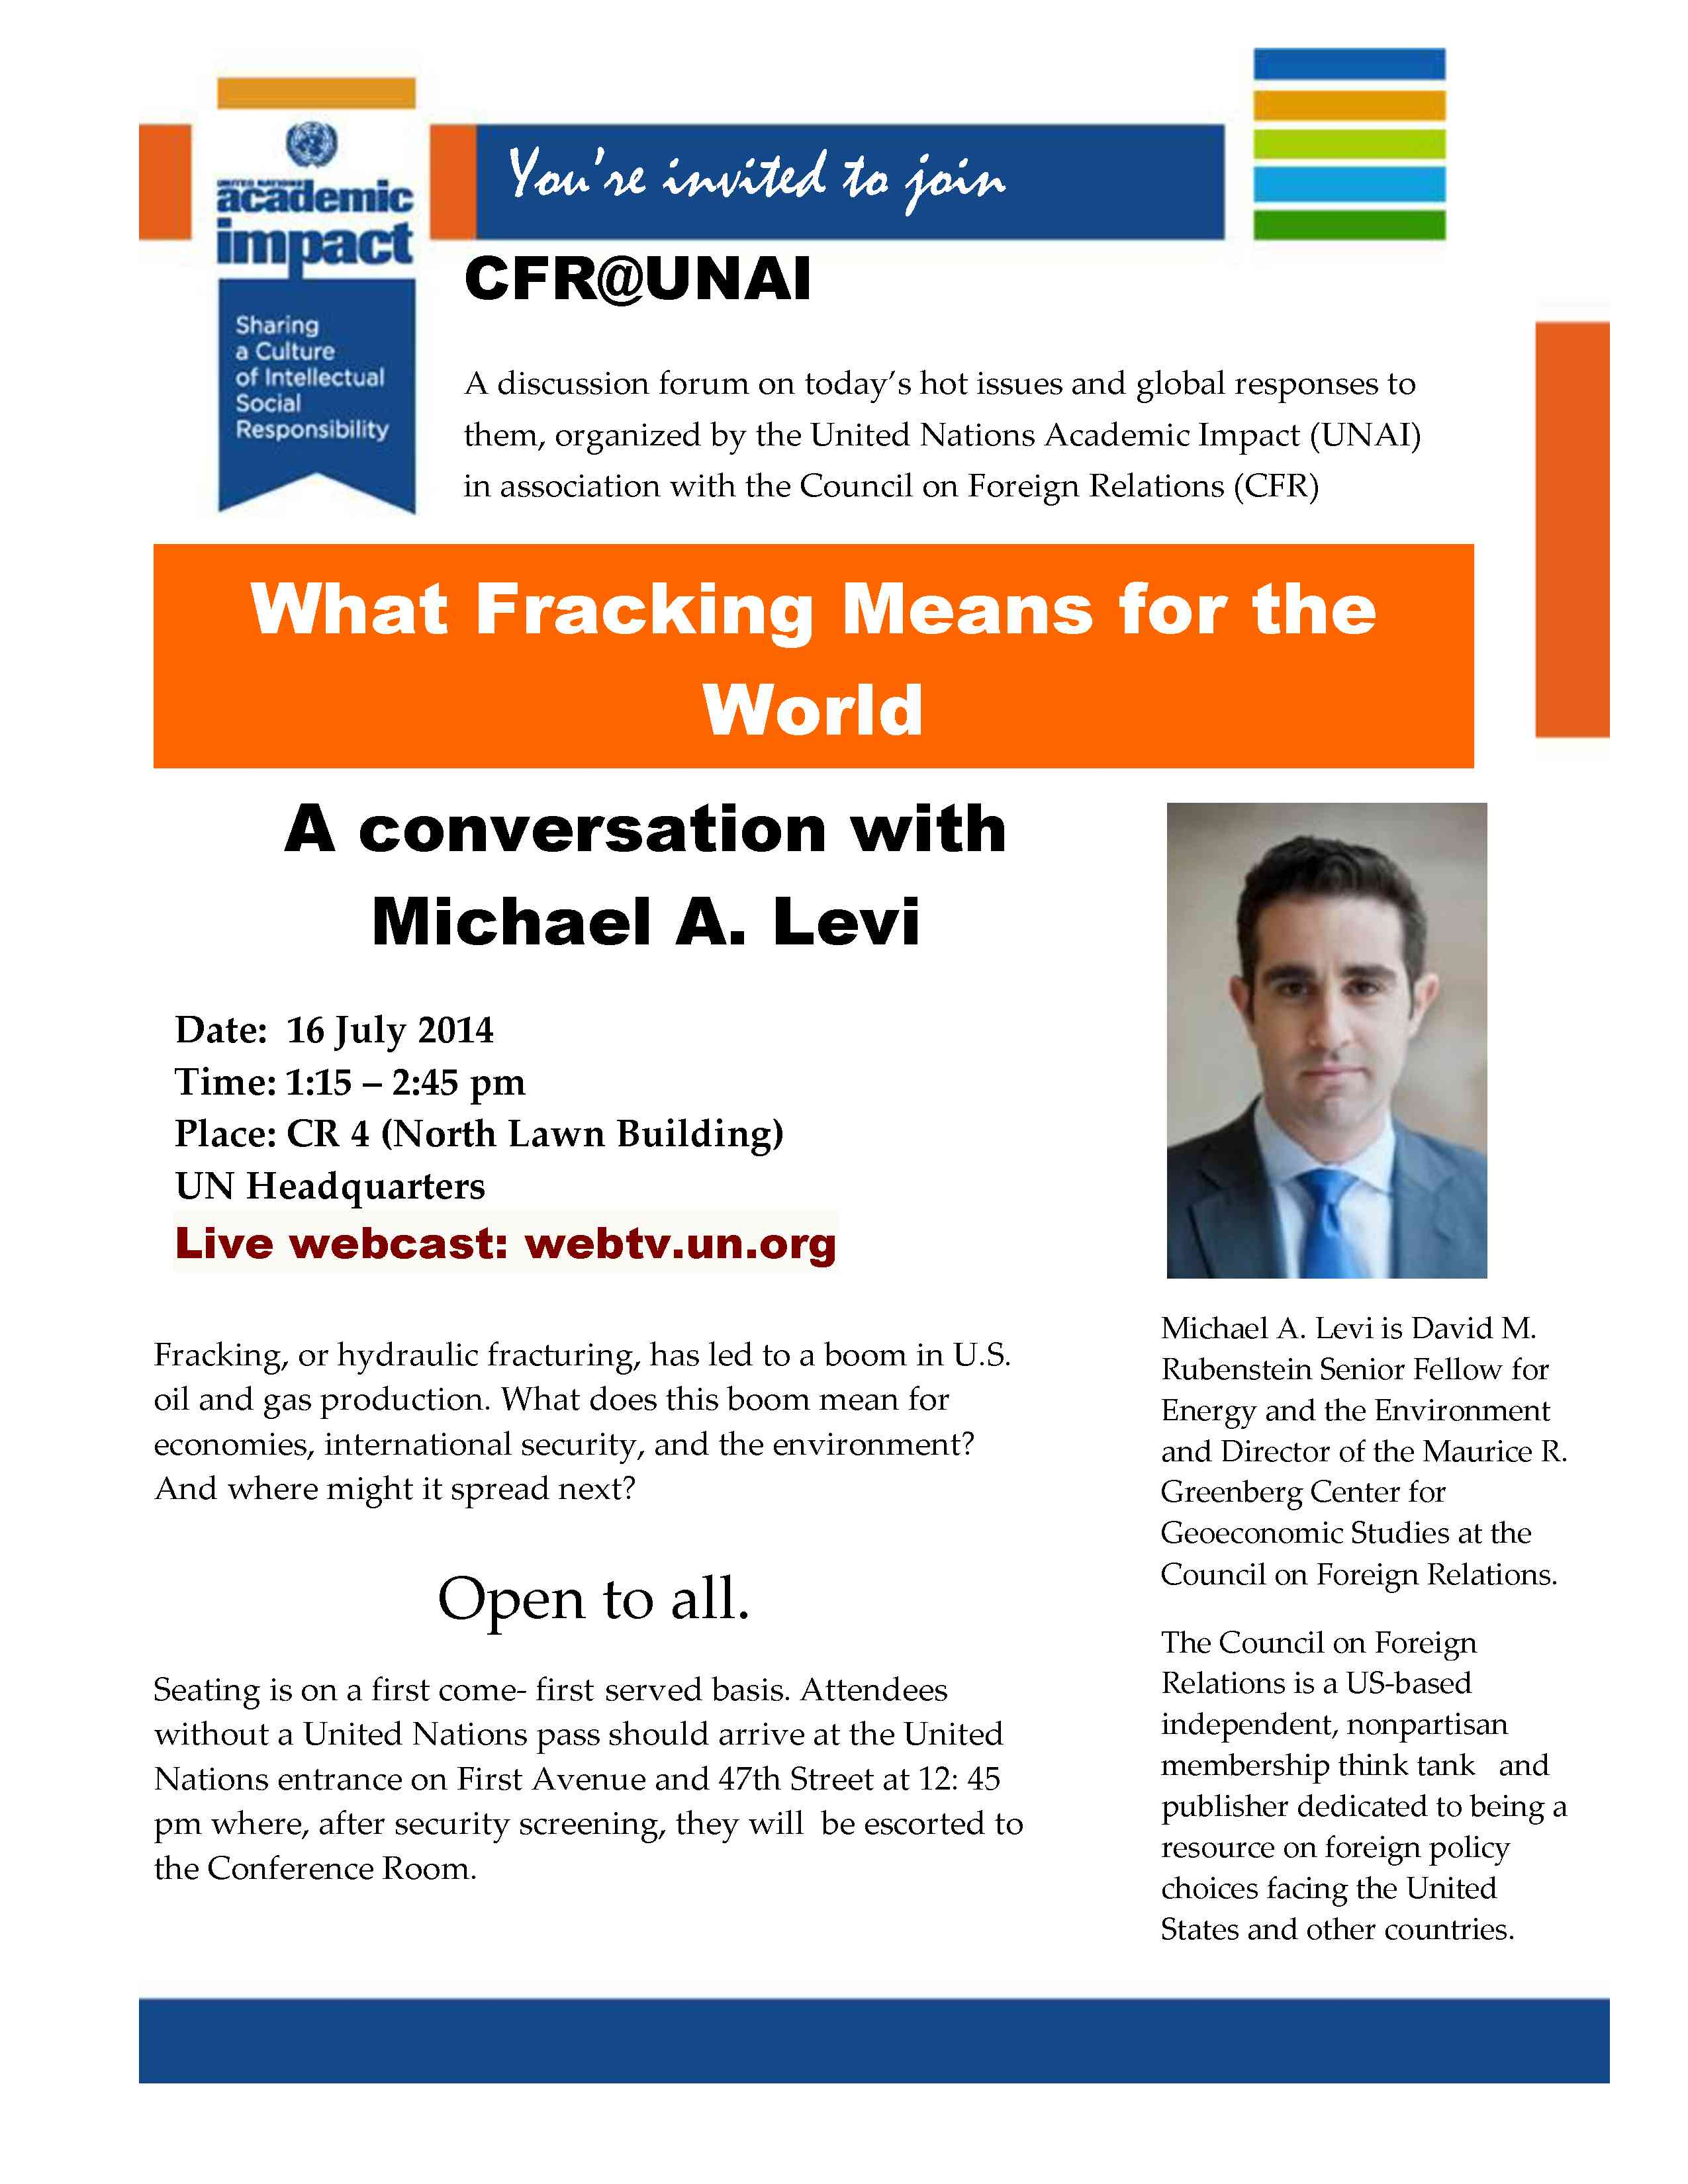 event fracking